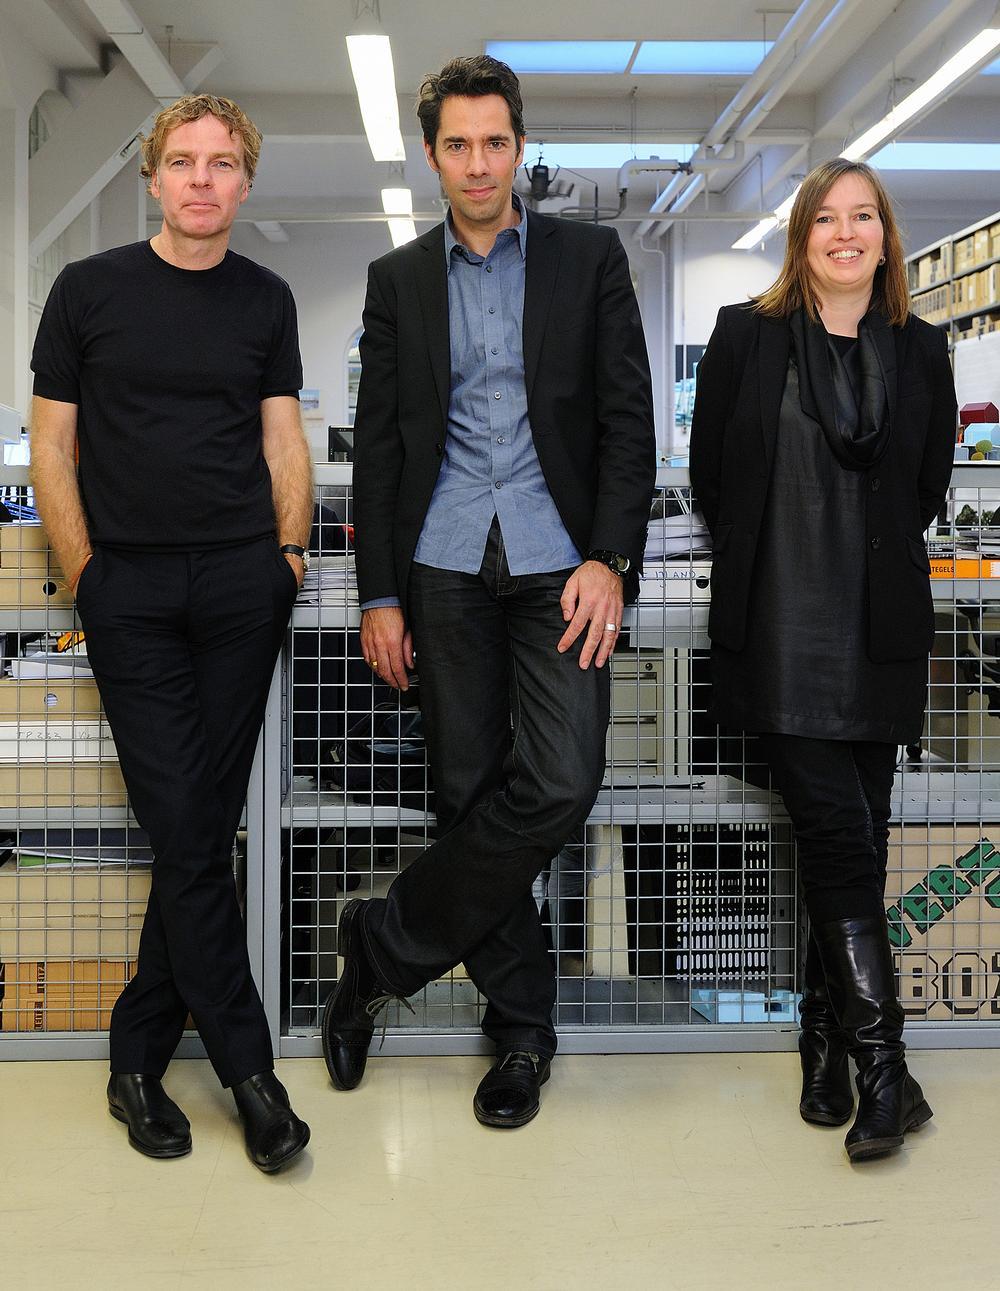 Winy Maas, Jacob van Rijs and Nathalie de Vries founders of MVRDV